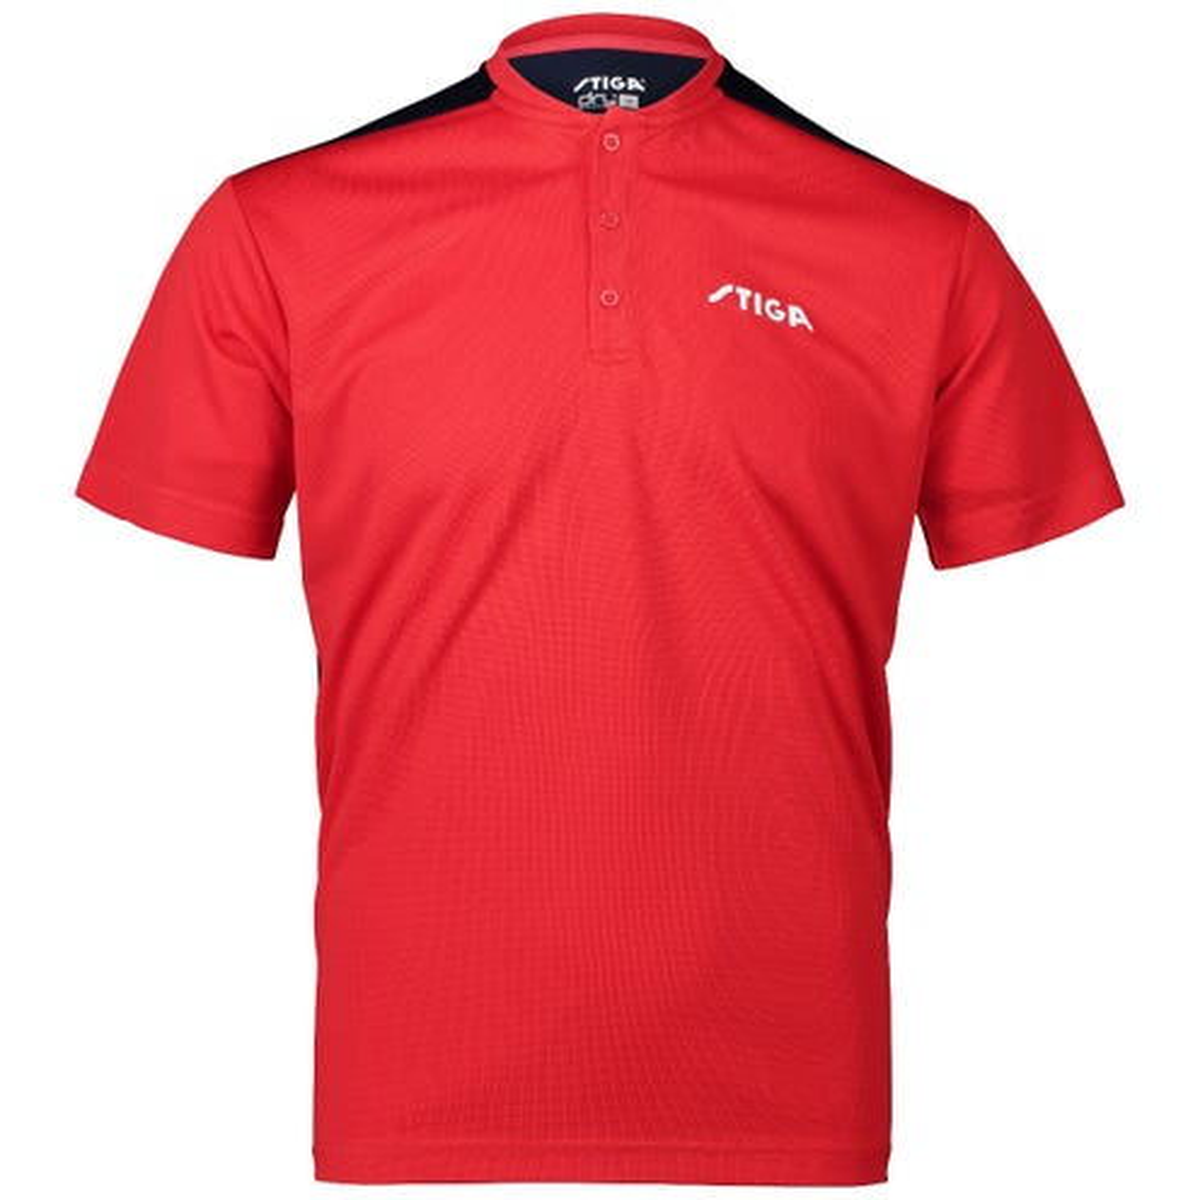 Stiga Club Red/Marine